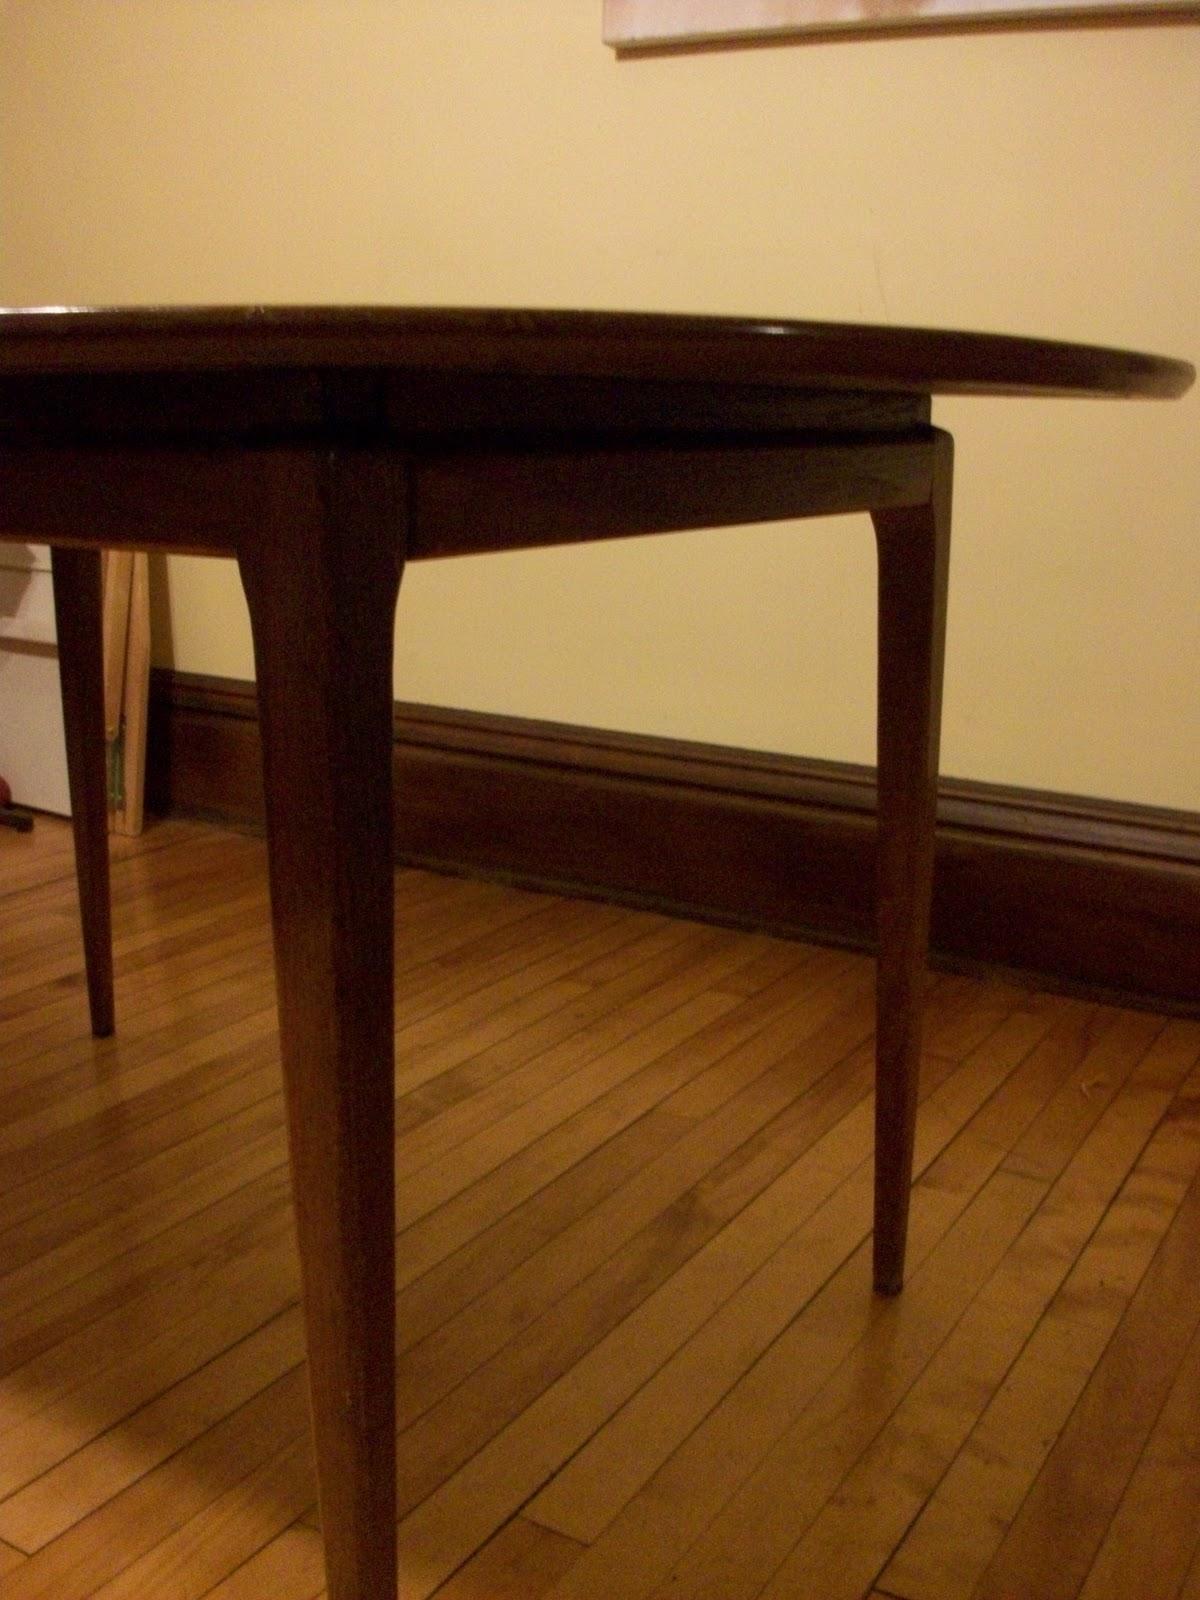 Con Sofas Designs cs Extendable dining table : 1007128 from consofasdesigns.blogspot.com size 1200 x 1600 jpeg 235kB